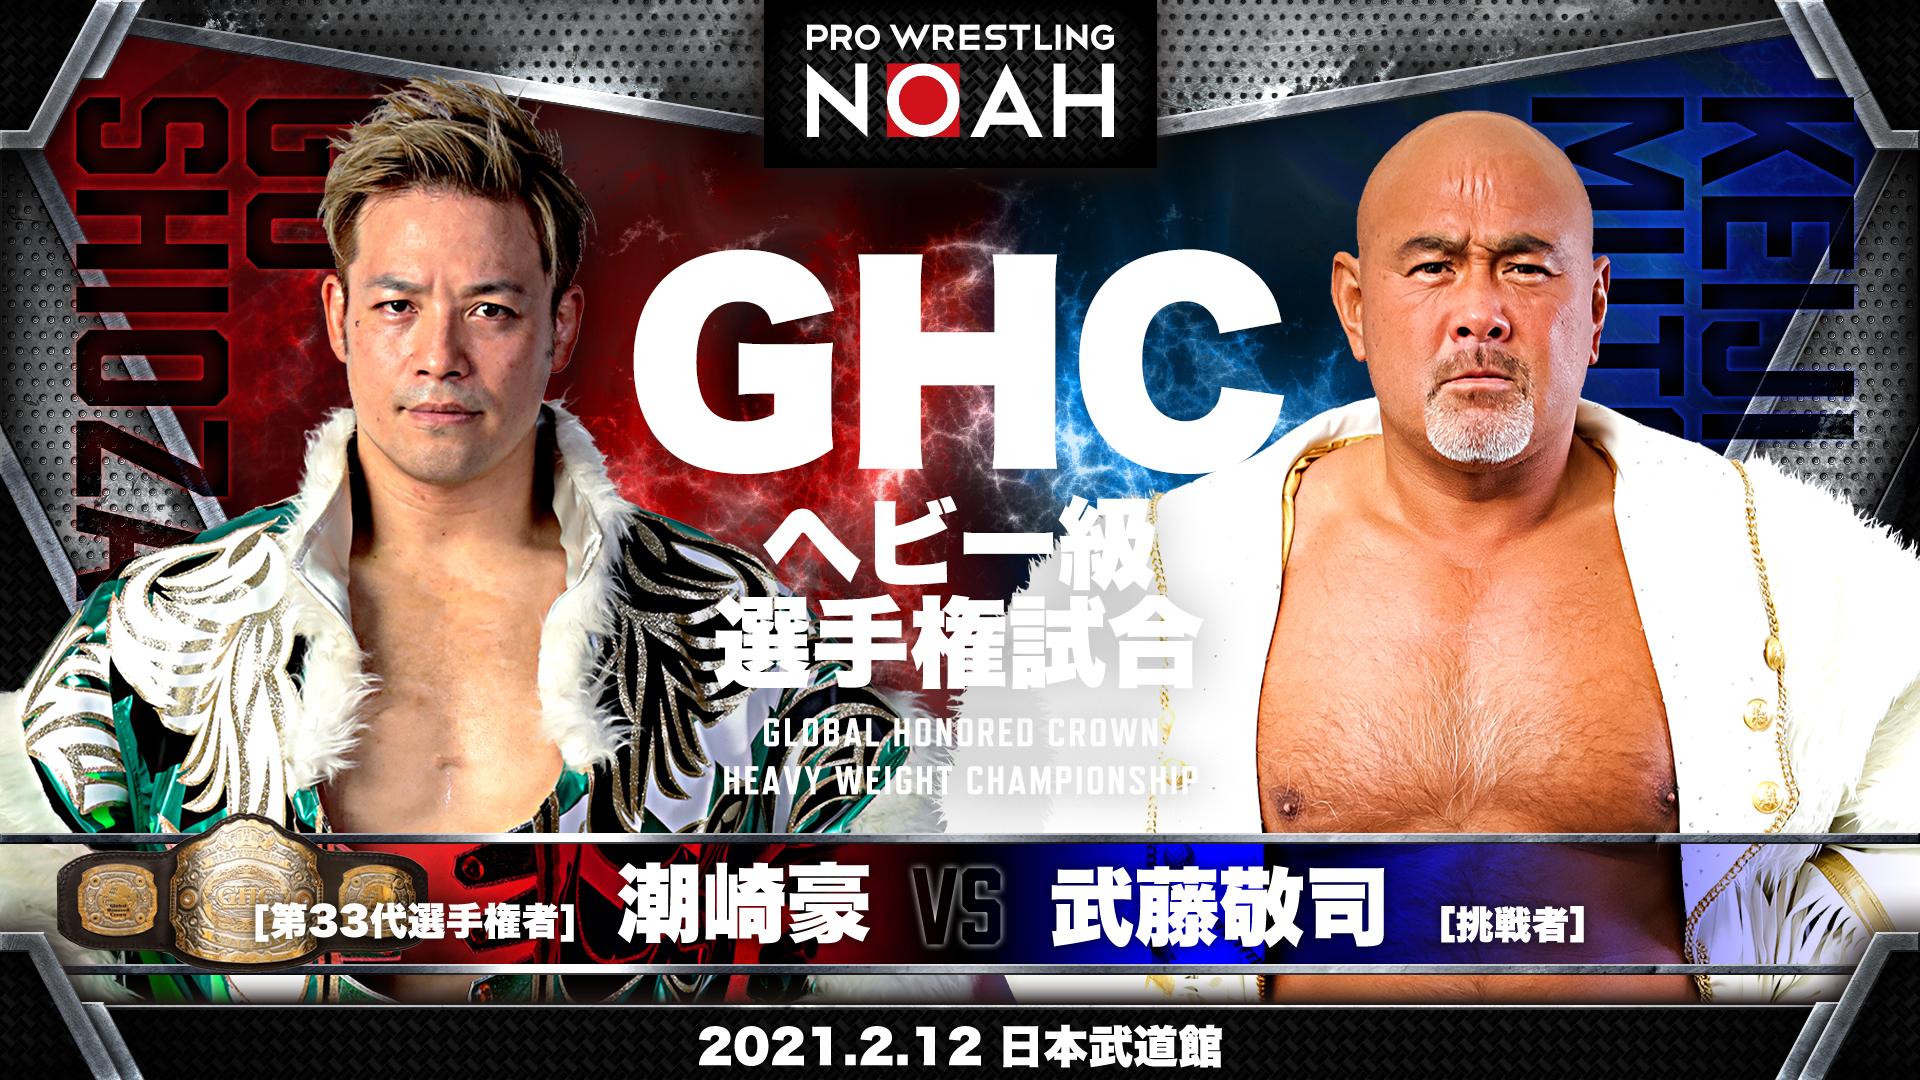 ■GHCヘビー級選手権試合 (第33代選手権者)潮崎豪vs武藤敬司(挑戦者)